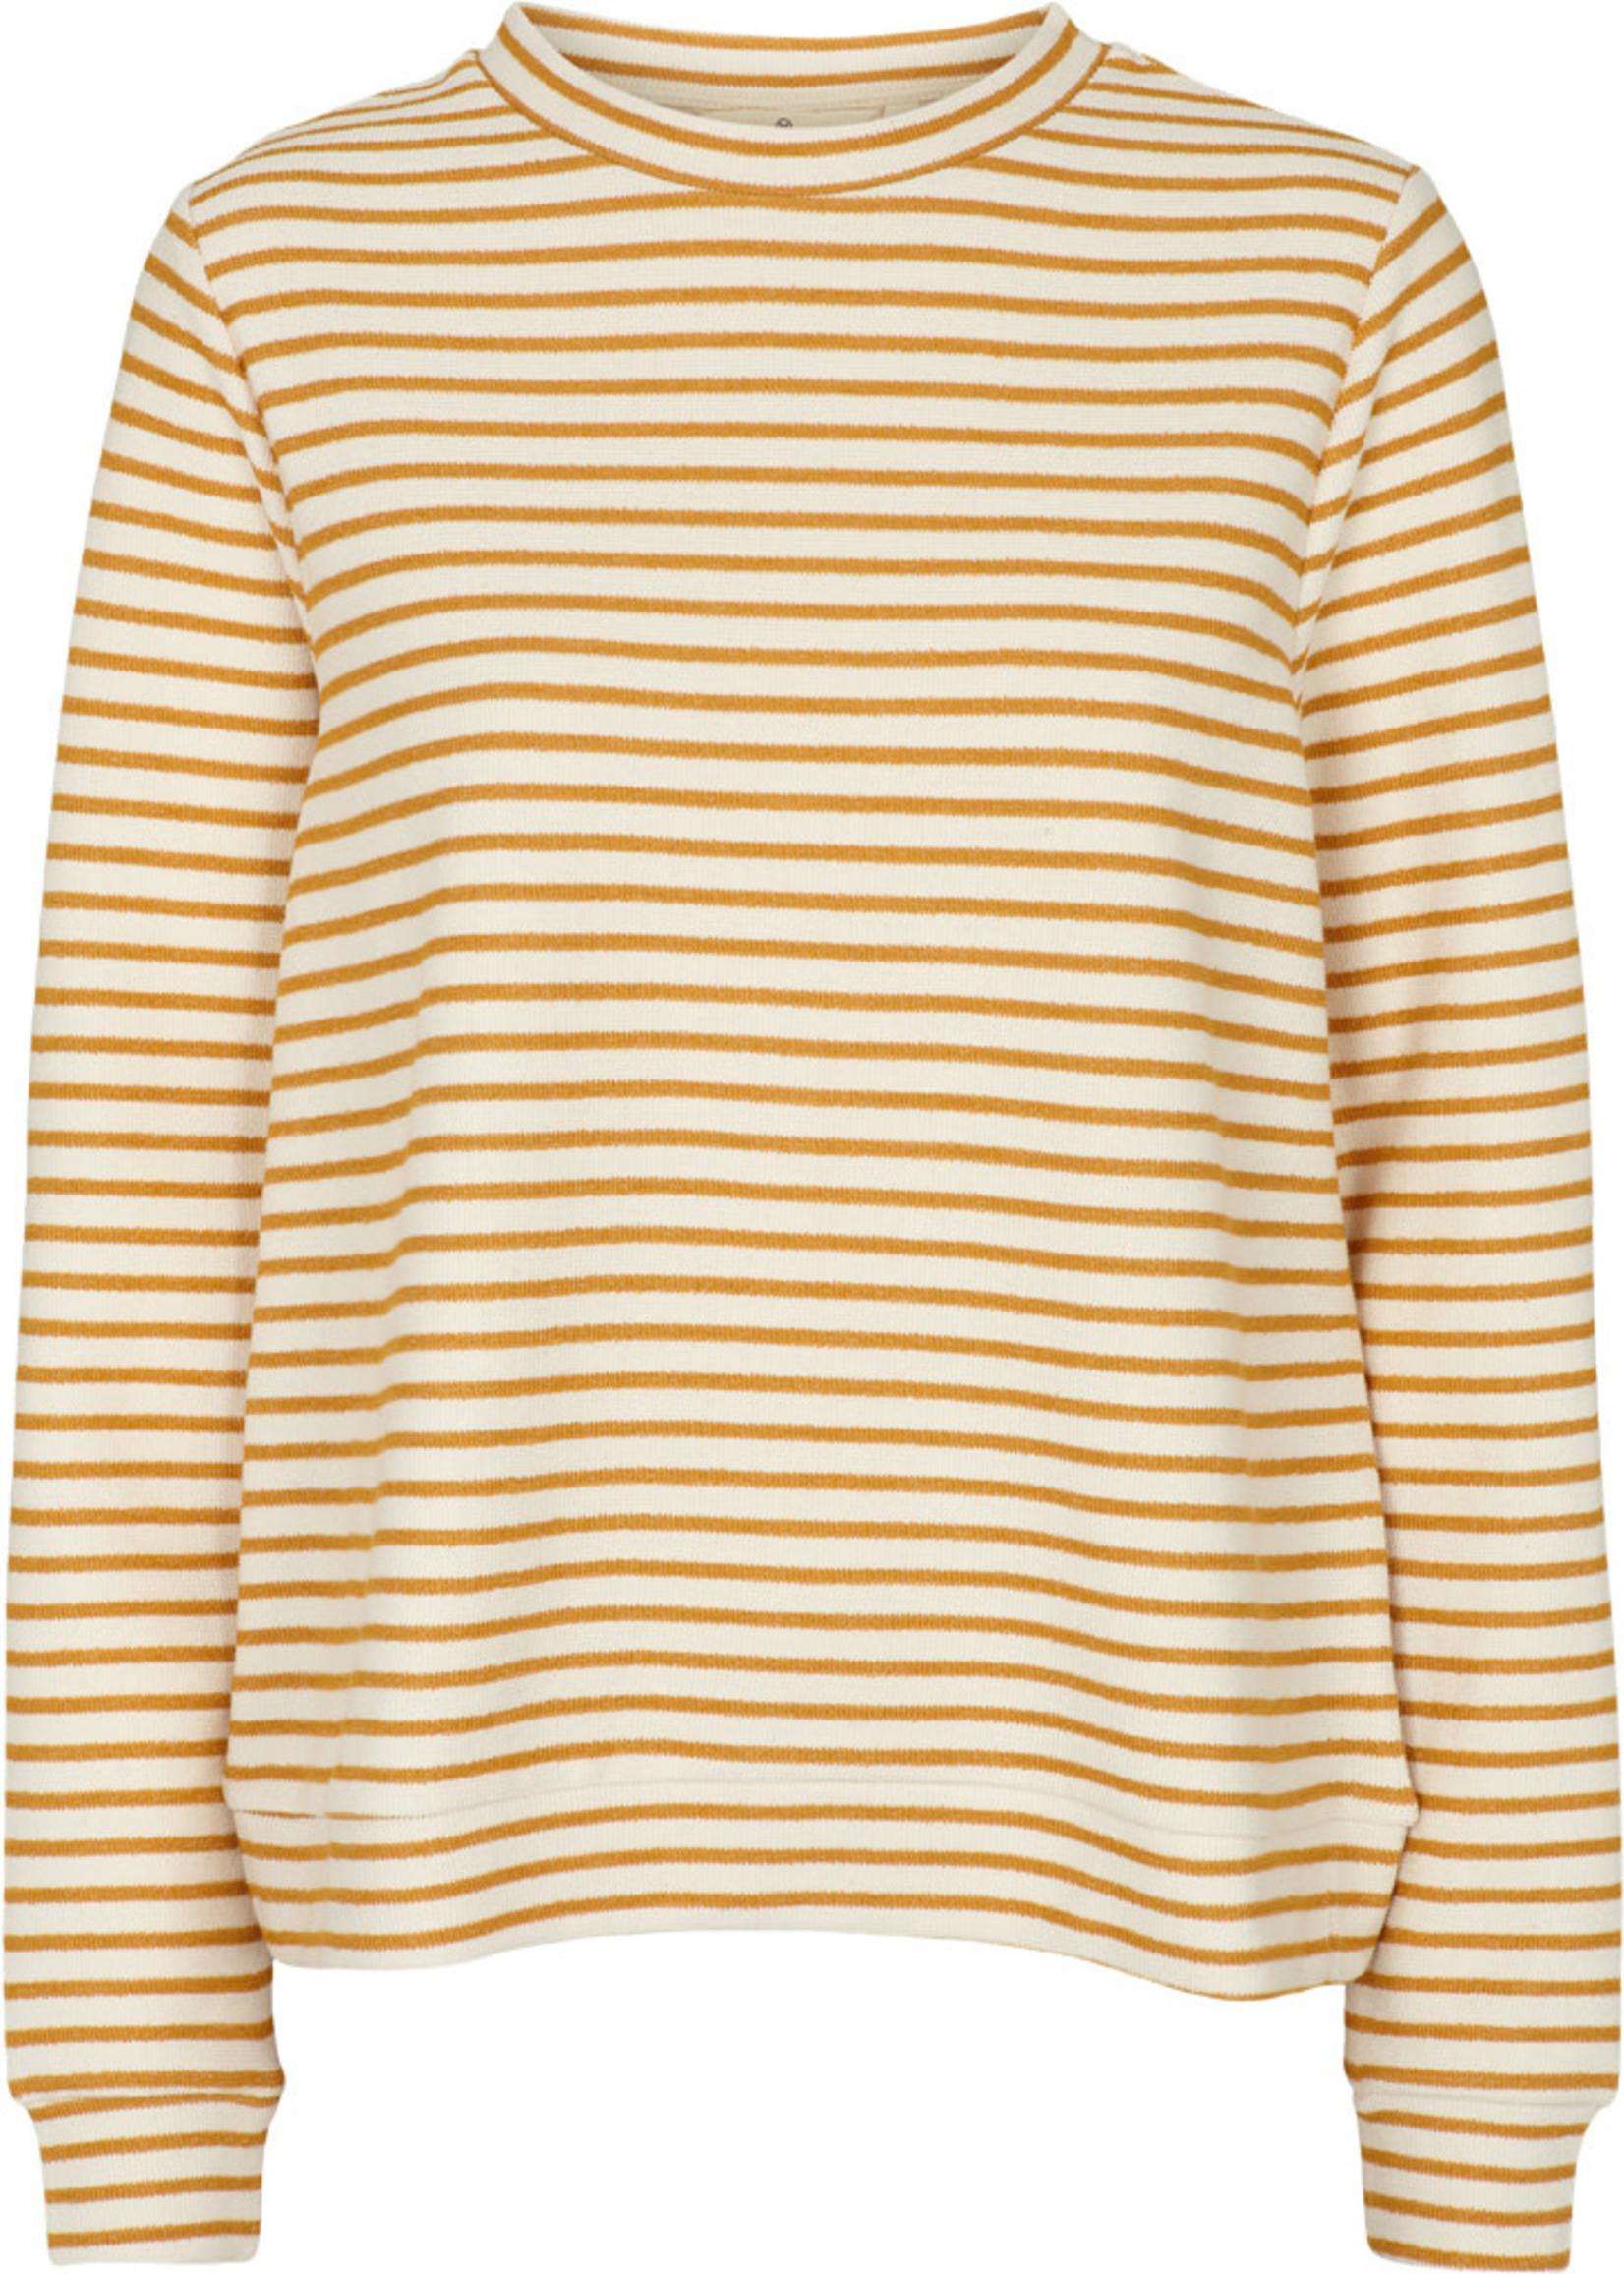 Basic Apparel Vendela Sweatshirt